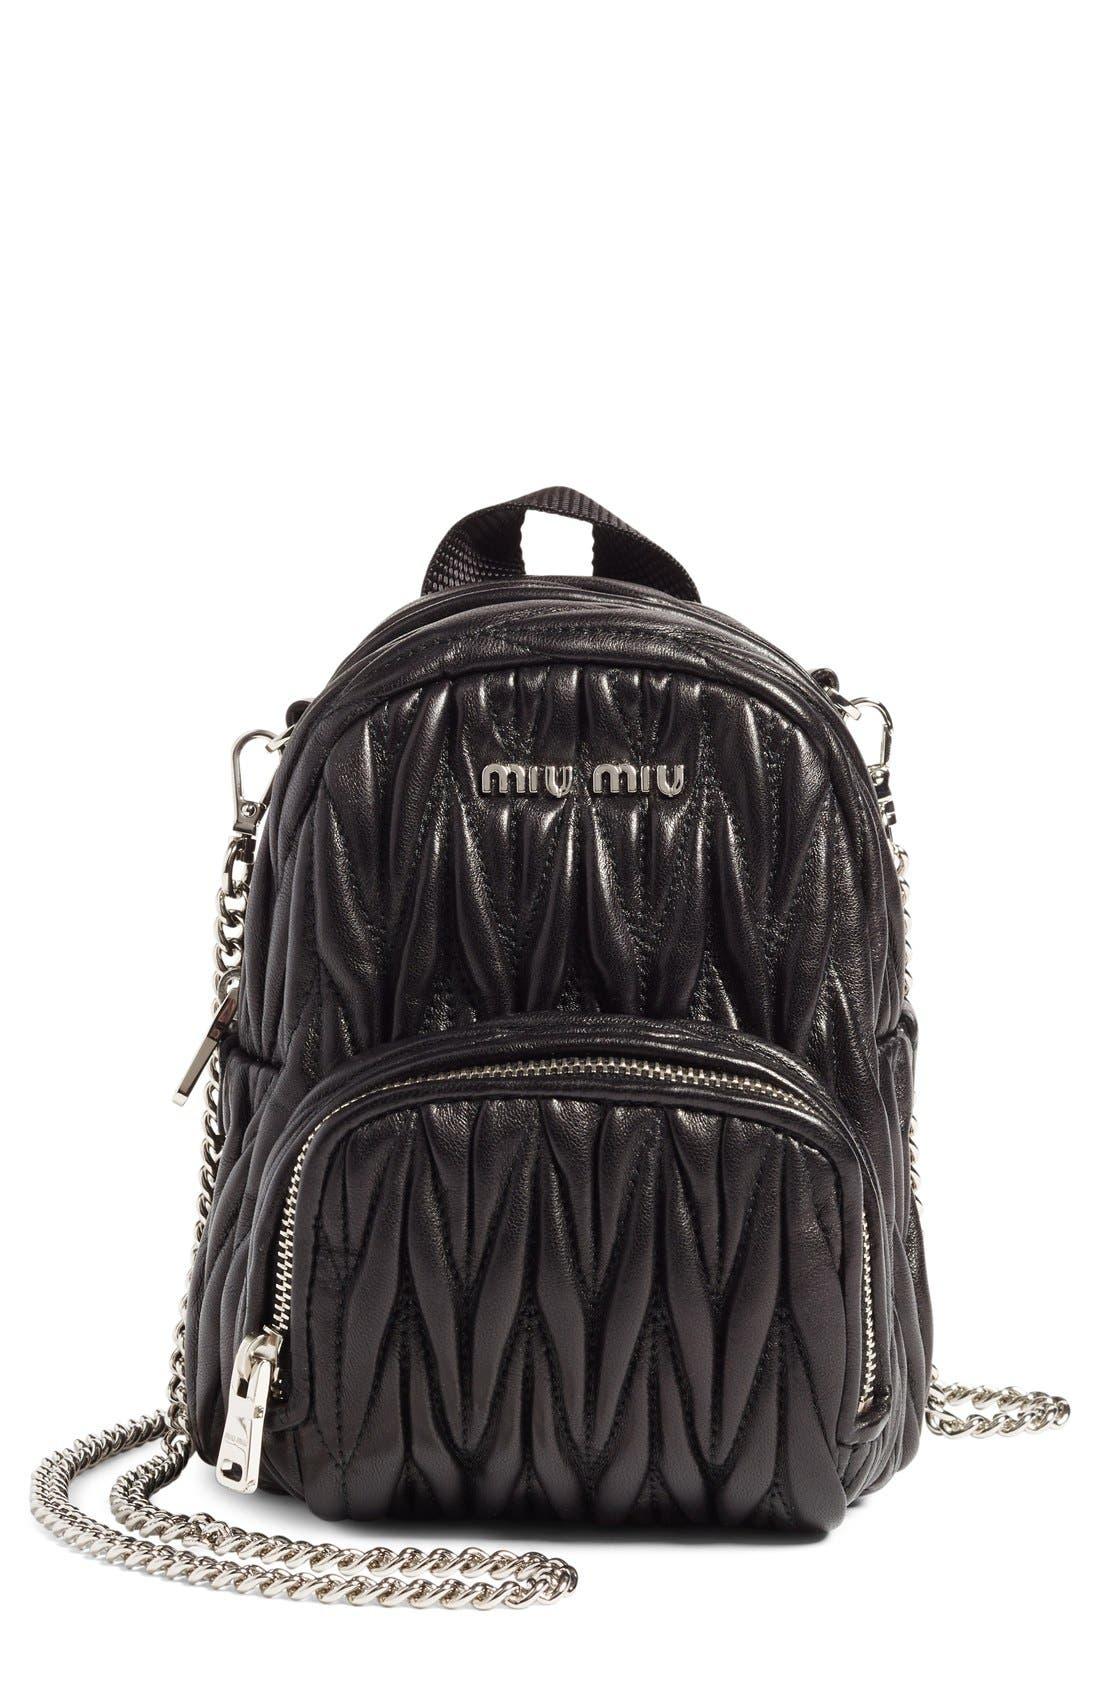 Main Image - Miu Miu Micro Matelassé Leather Backpack